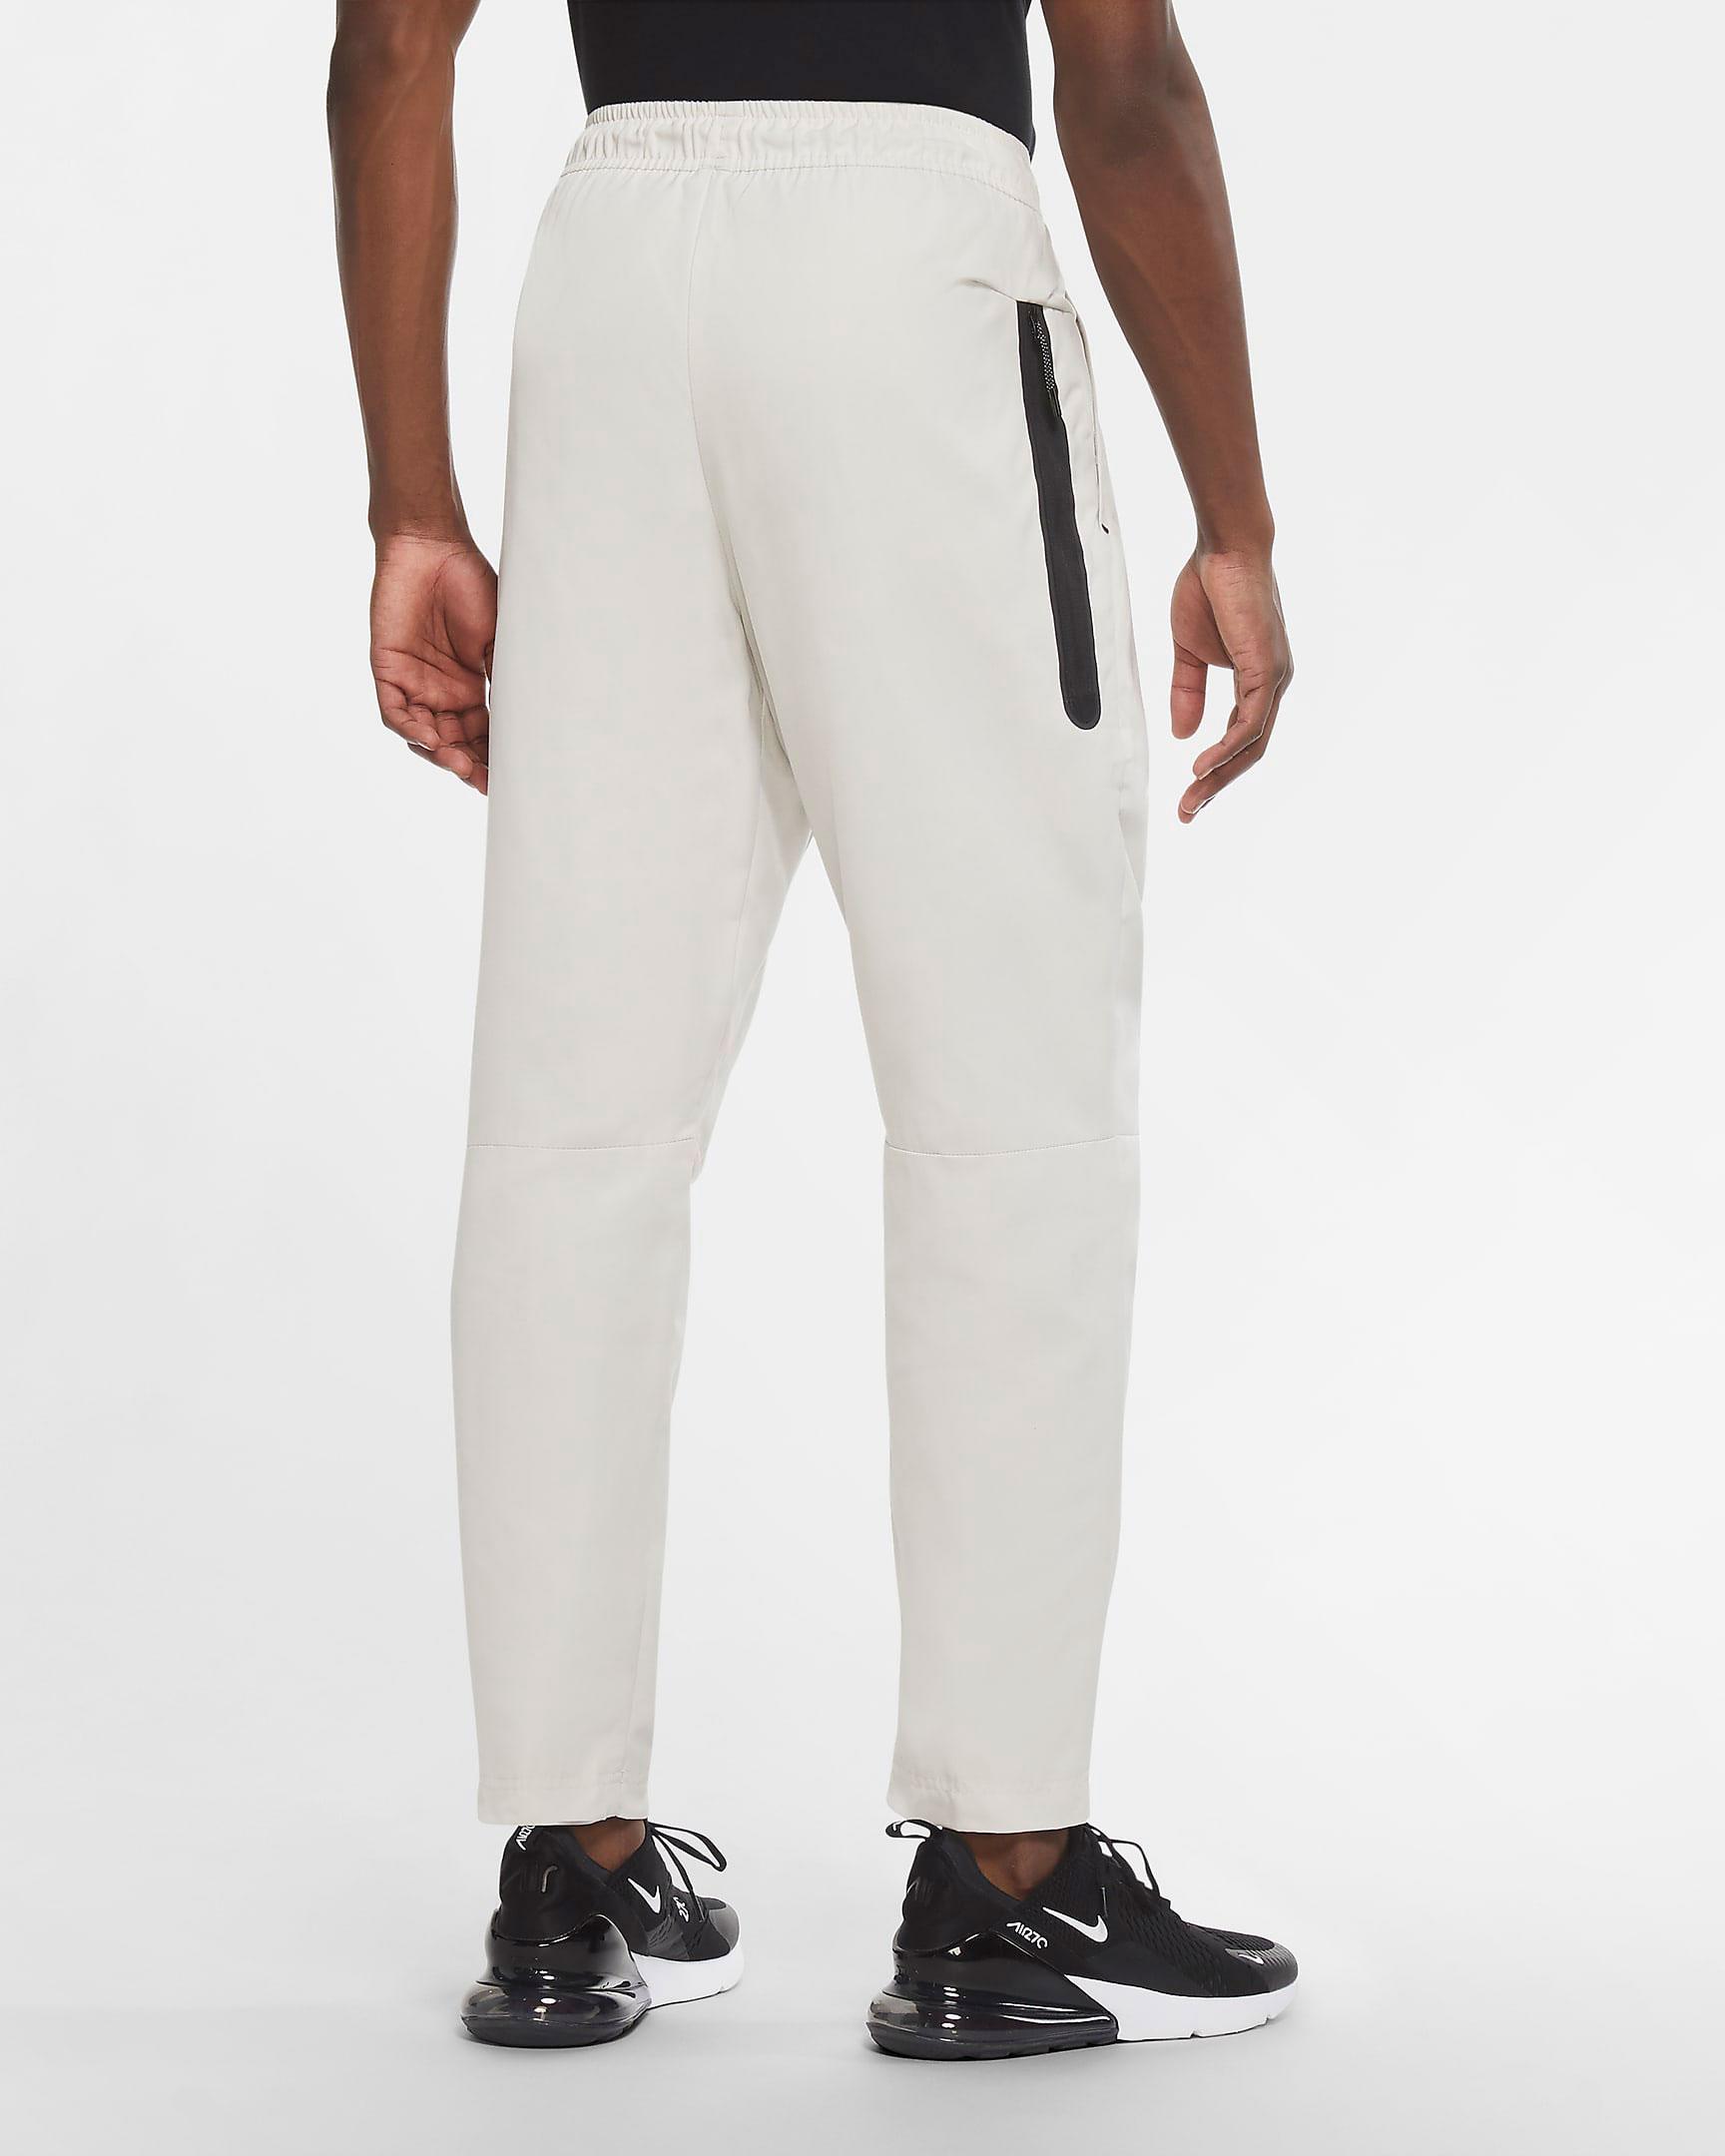 off-white-air-jordan-5-sail-nike-pants-match-2